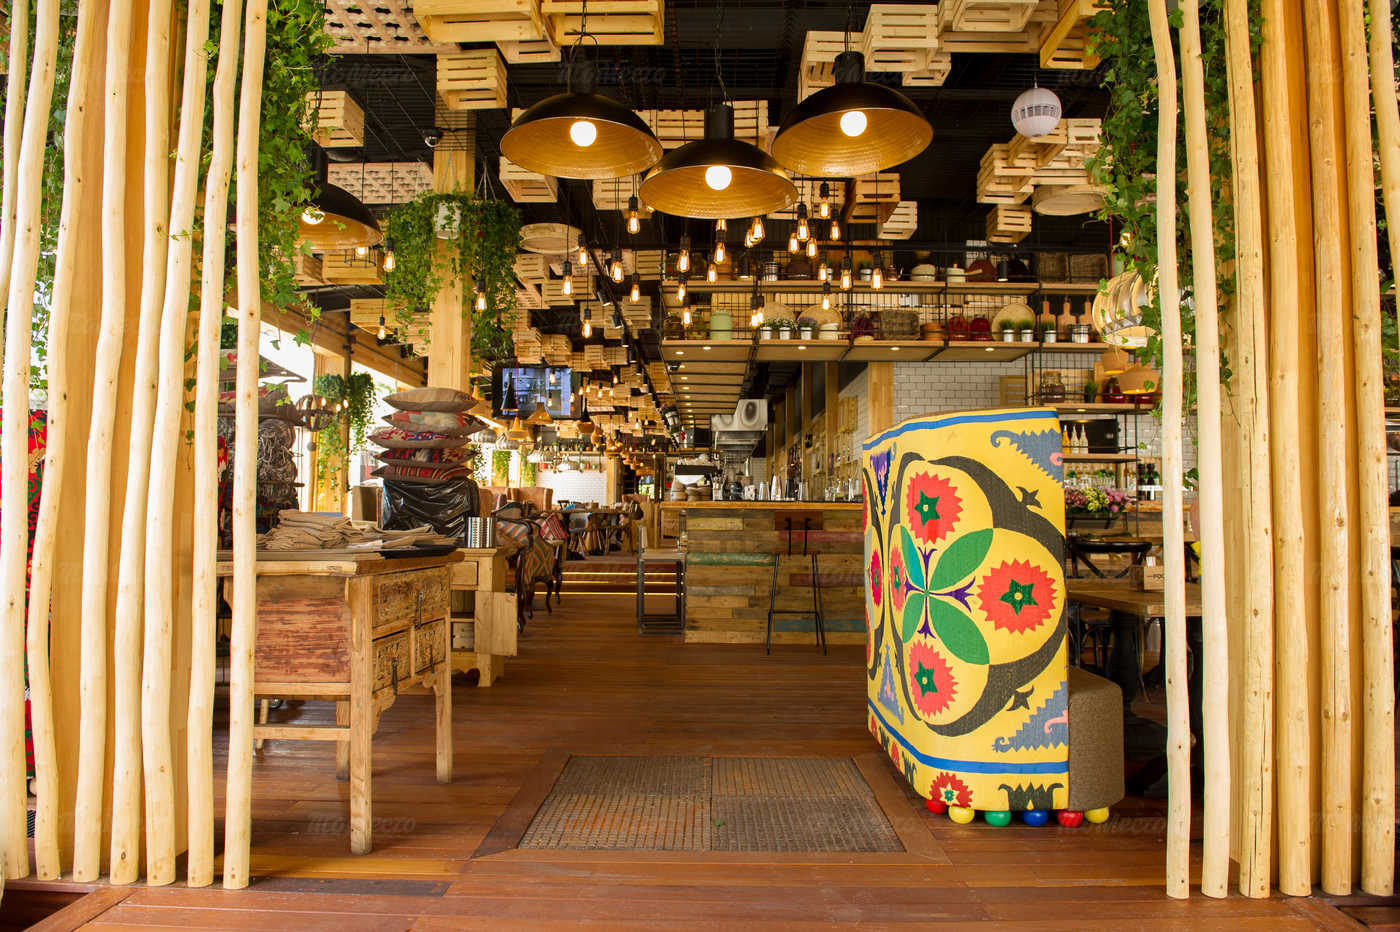 Банкеты ресторана FOOD BAZAR (Фуд базар) на улице Каретный Ряд фото 16